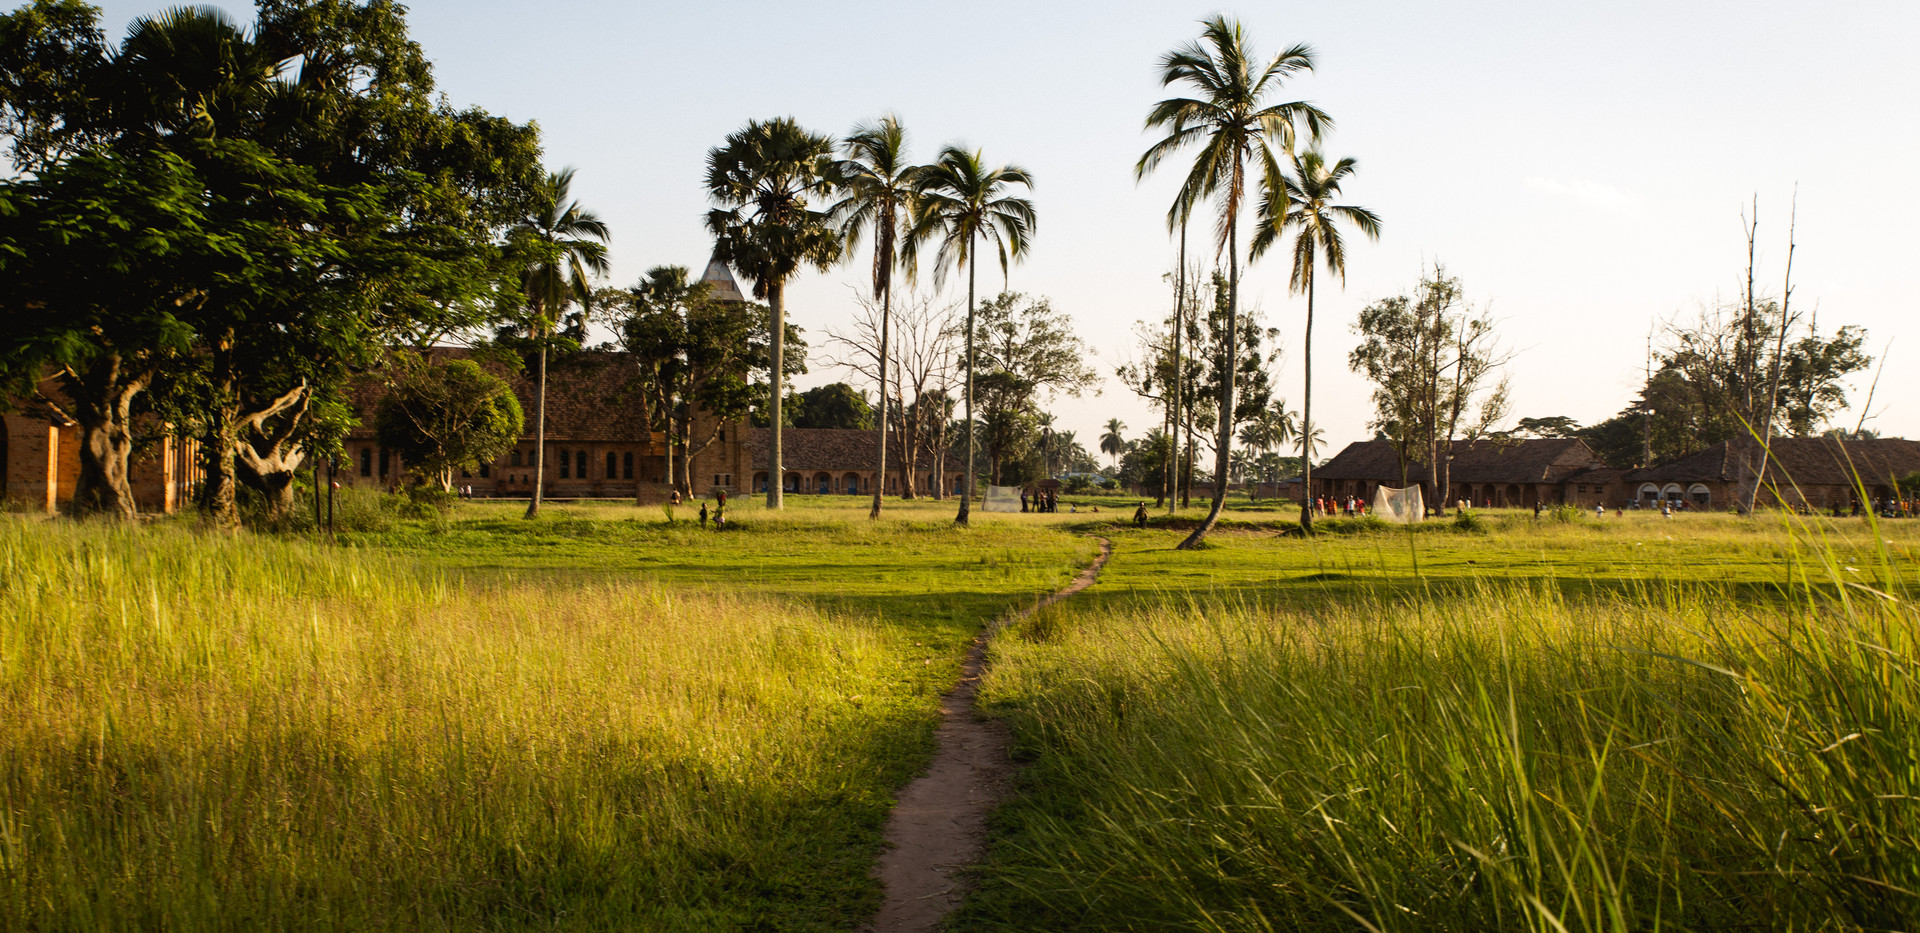 In tshibala, the sun sets on the village.